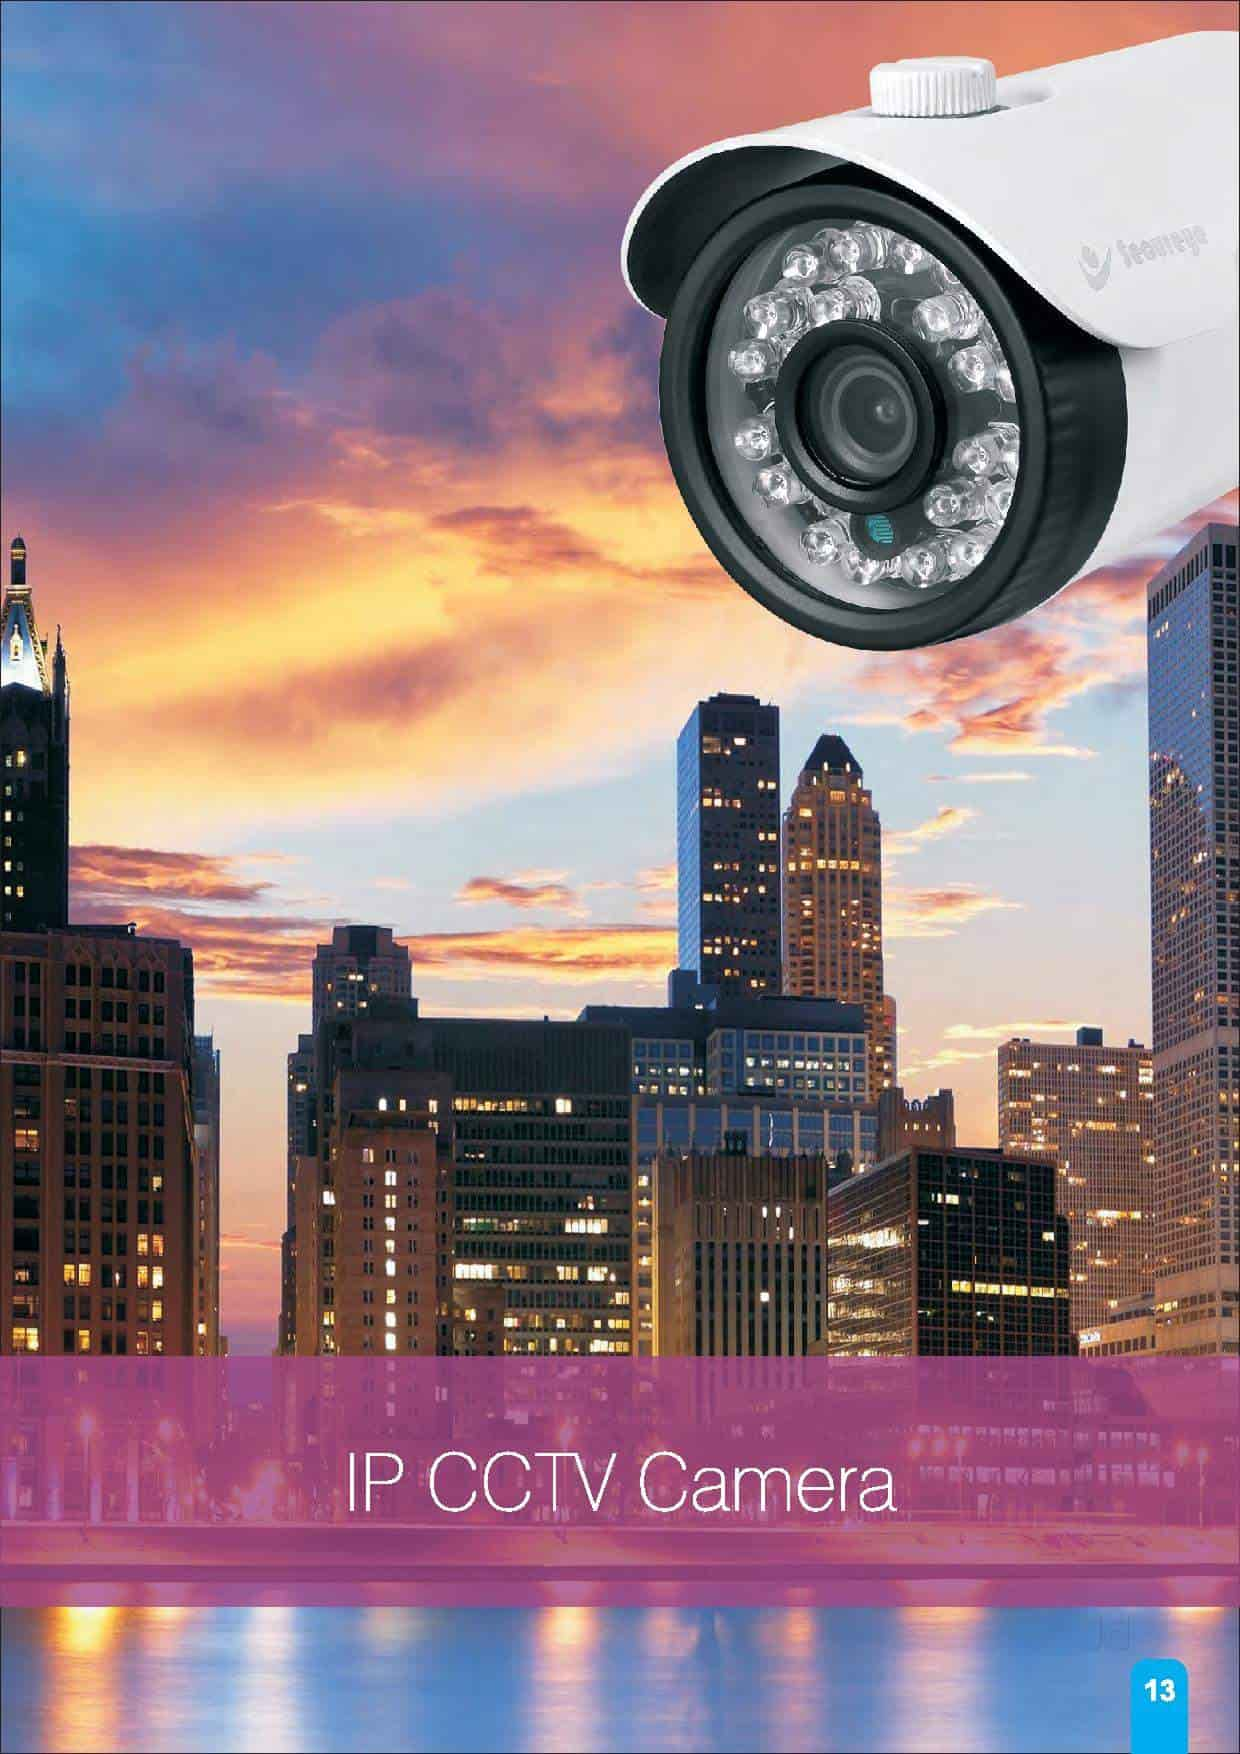 Fortune Marketing INDIA Pvt Ltd, OTC Road - CCTV Dealers in